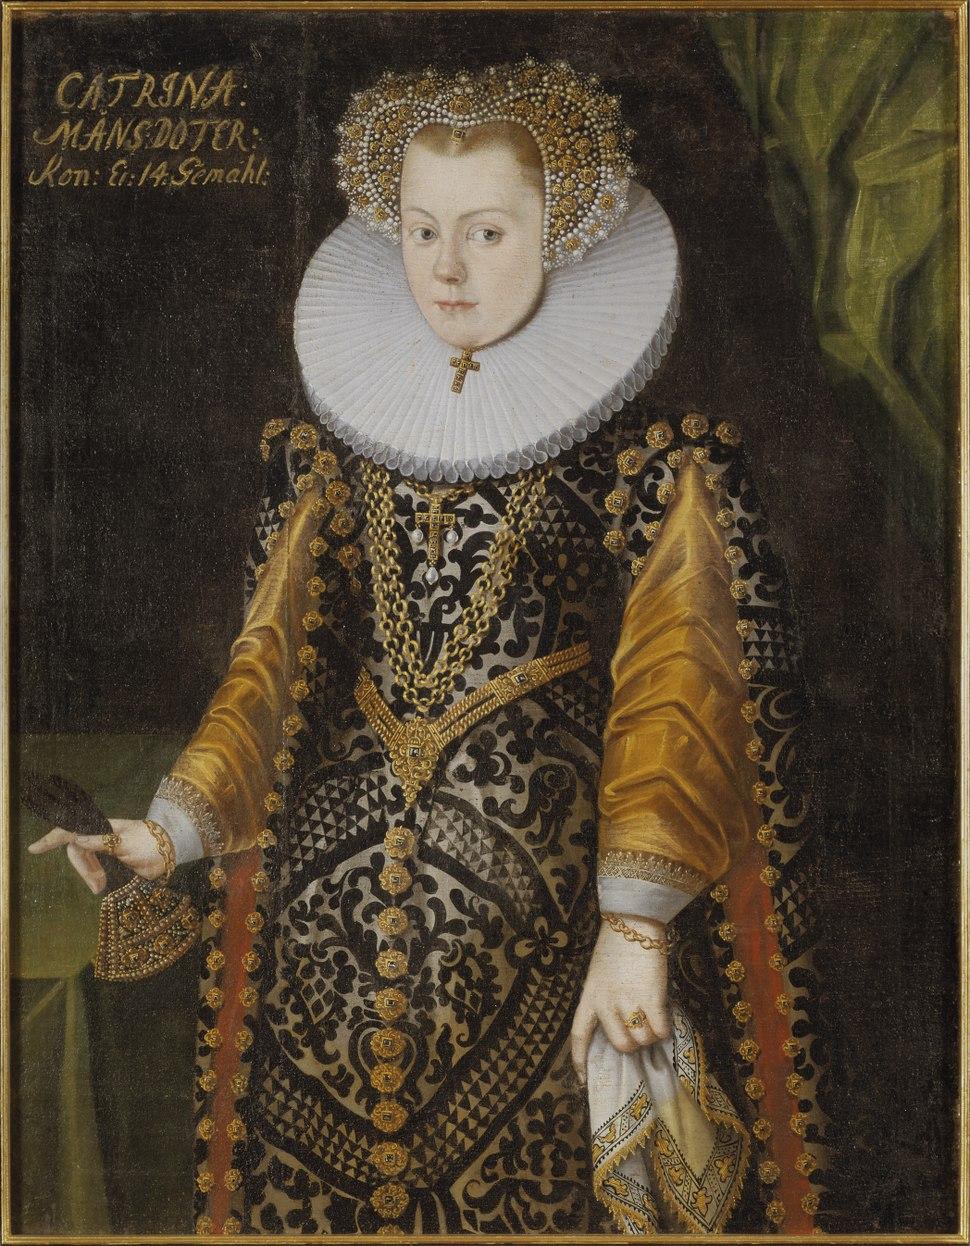 Ok%C3%A4nd kvinna, tidigare kallad Elisabet, 1549-1597, prinsessa av Sverige, hertiginna av Mecklenburg - Nationalmuseum - 15098